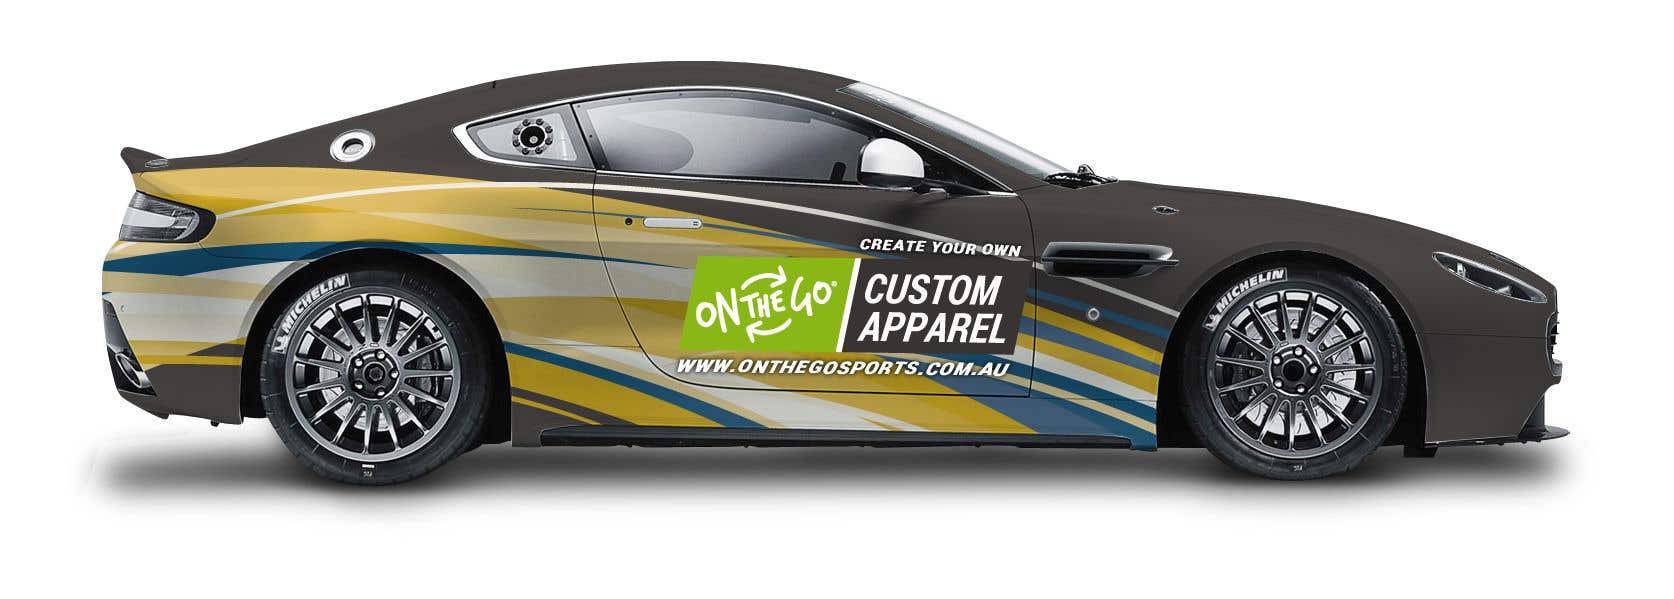 Entry By Kchrobak For Promotional Signage For Aston Martin - Aston martin apparel